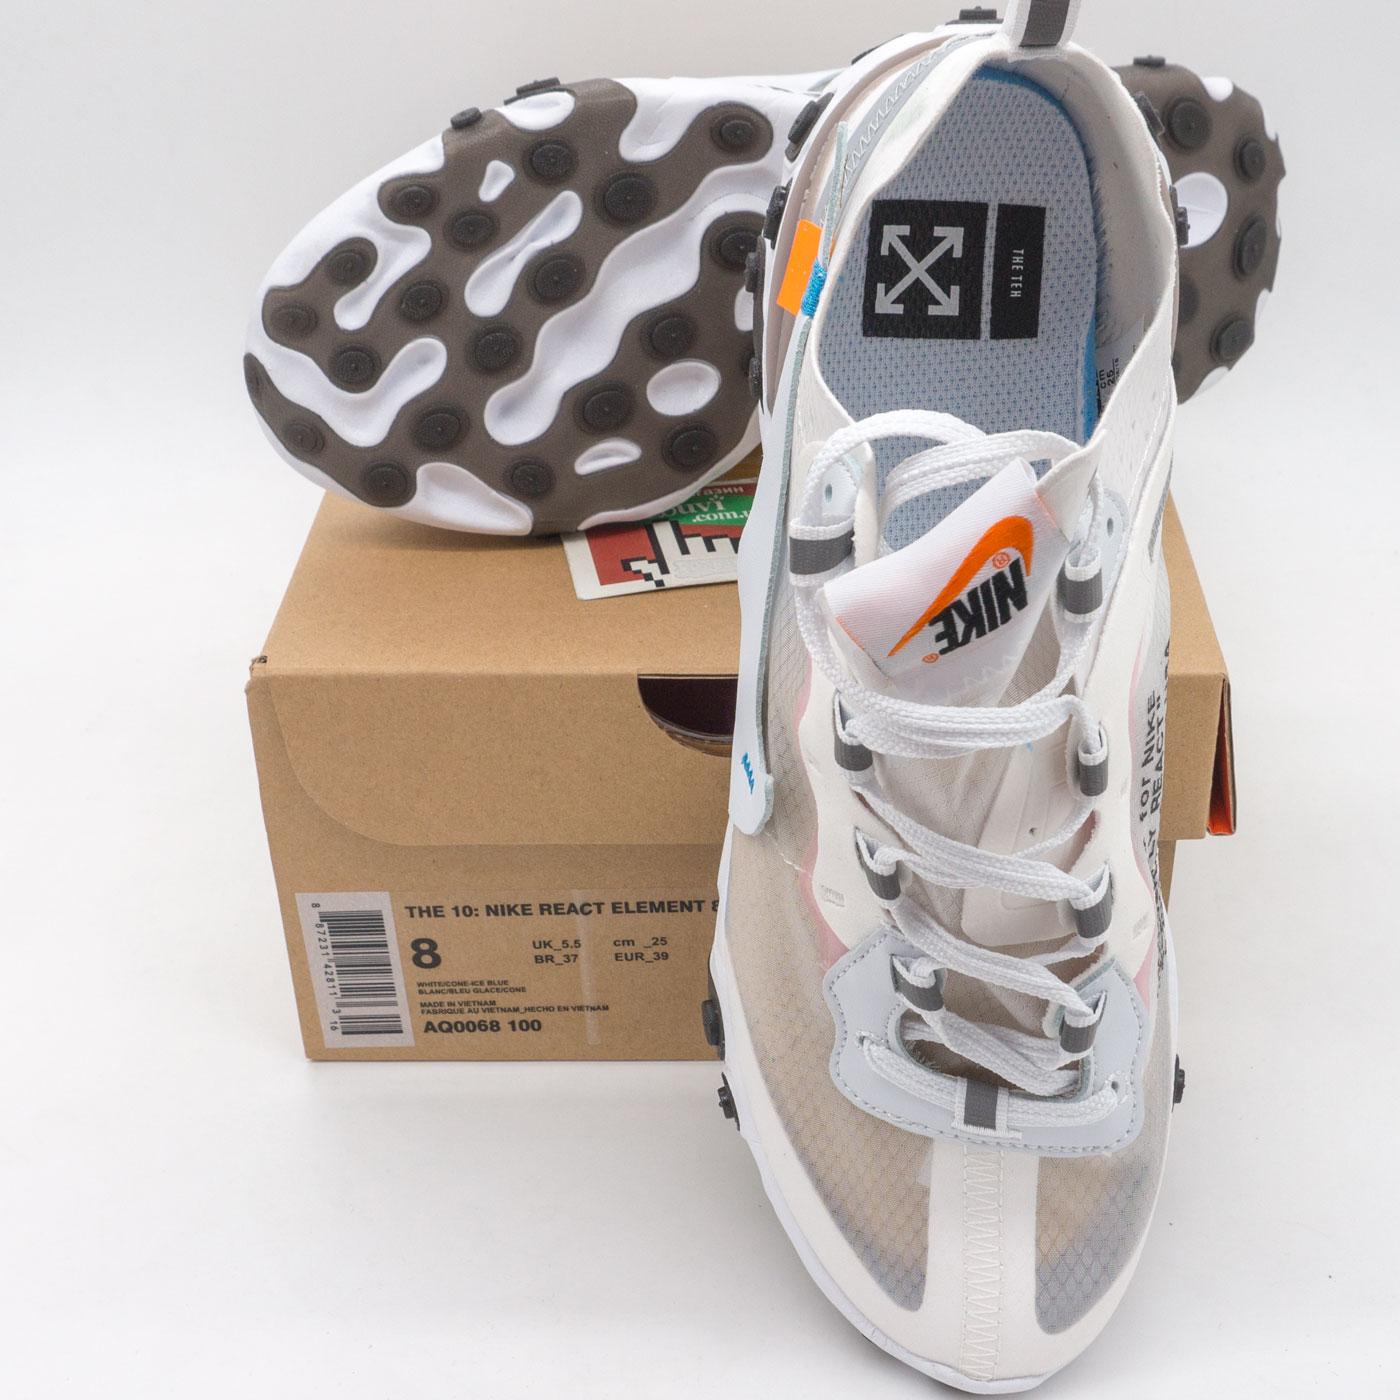 фото bottom Кроссовки Nike React 87 Undercover белые с серым. Топ качество! bottom